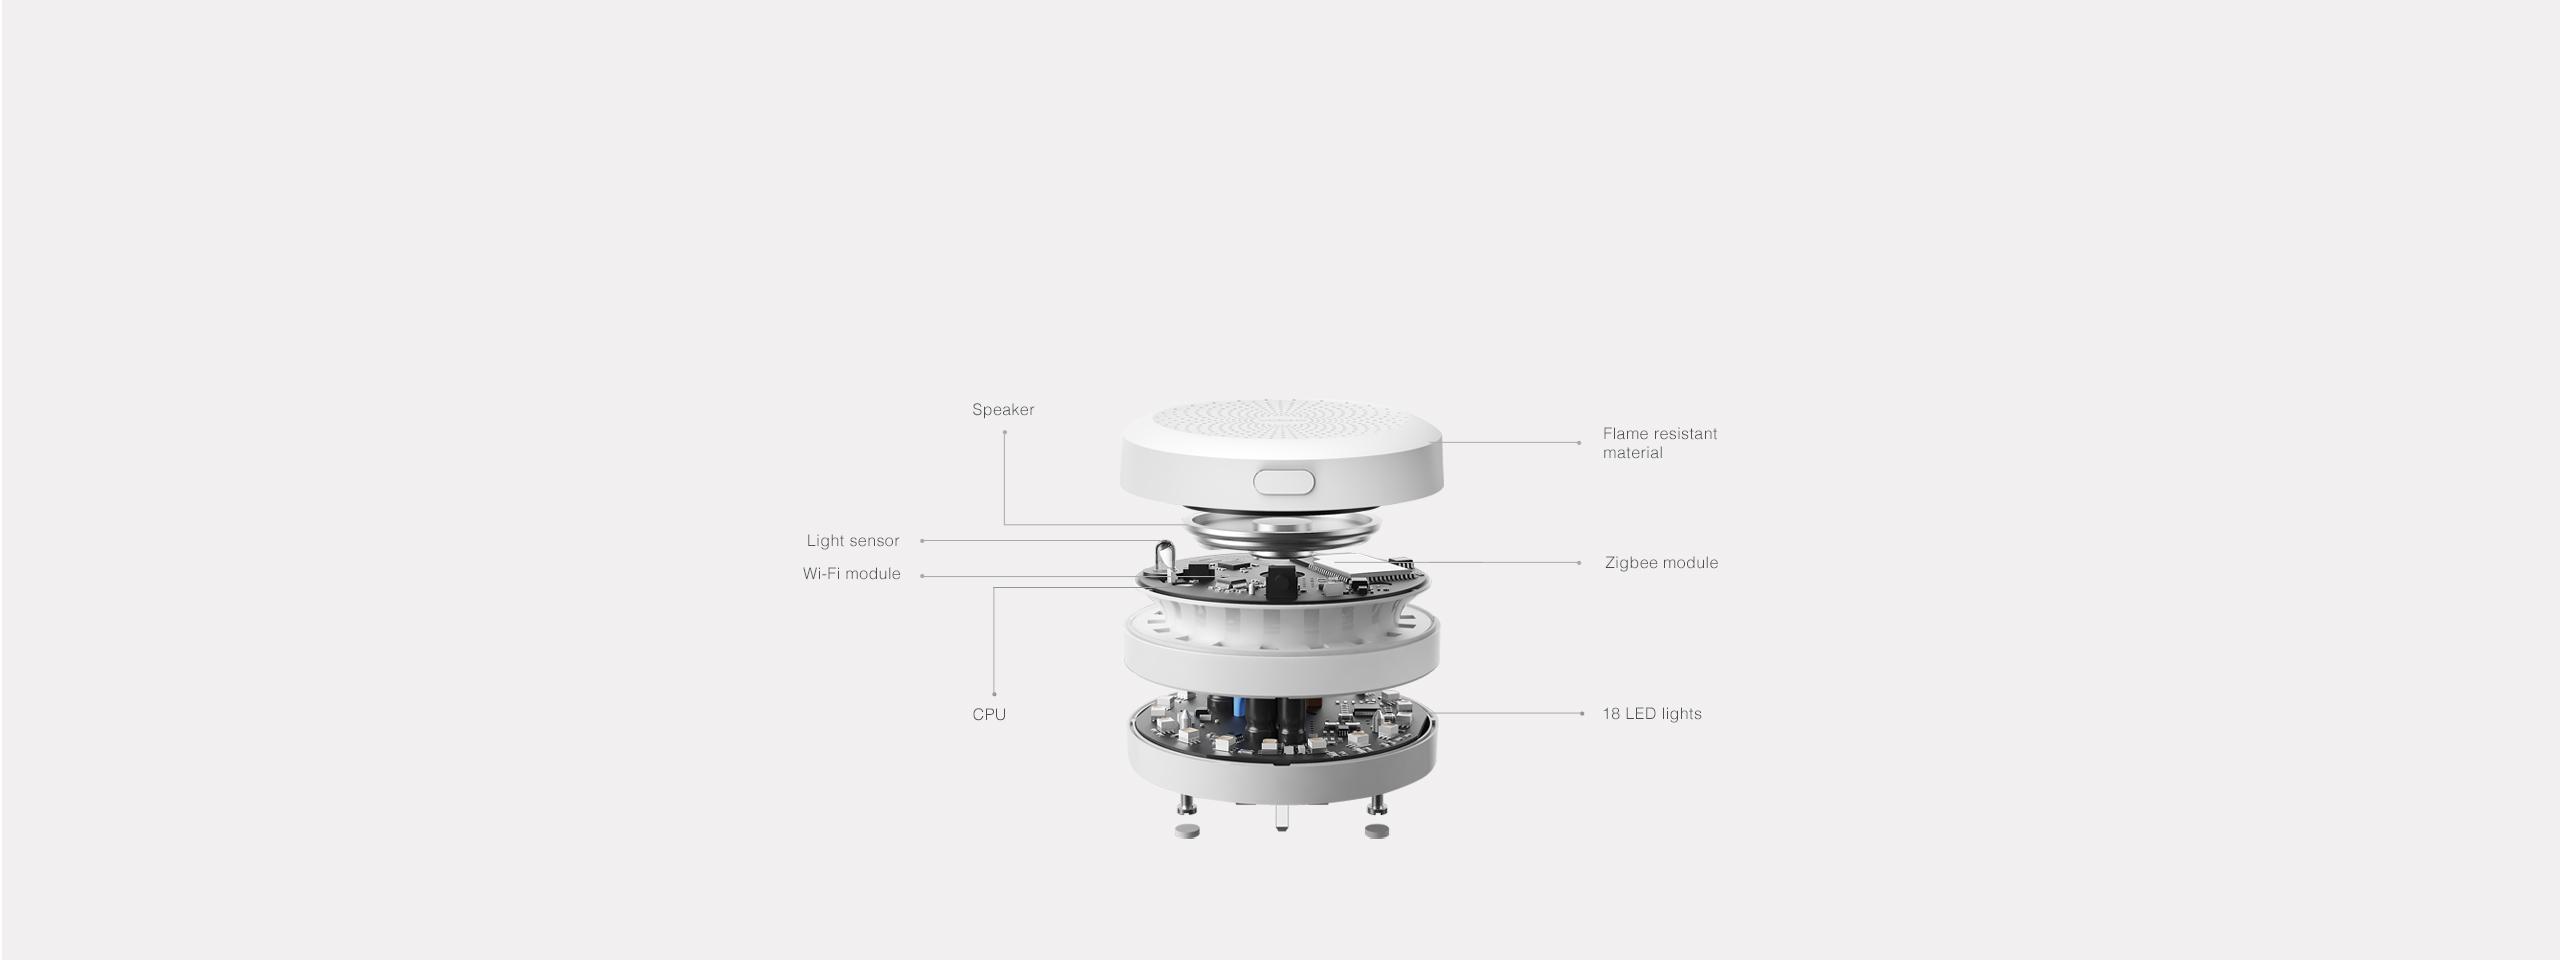 Aqara uk version hub technology